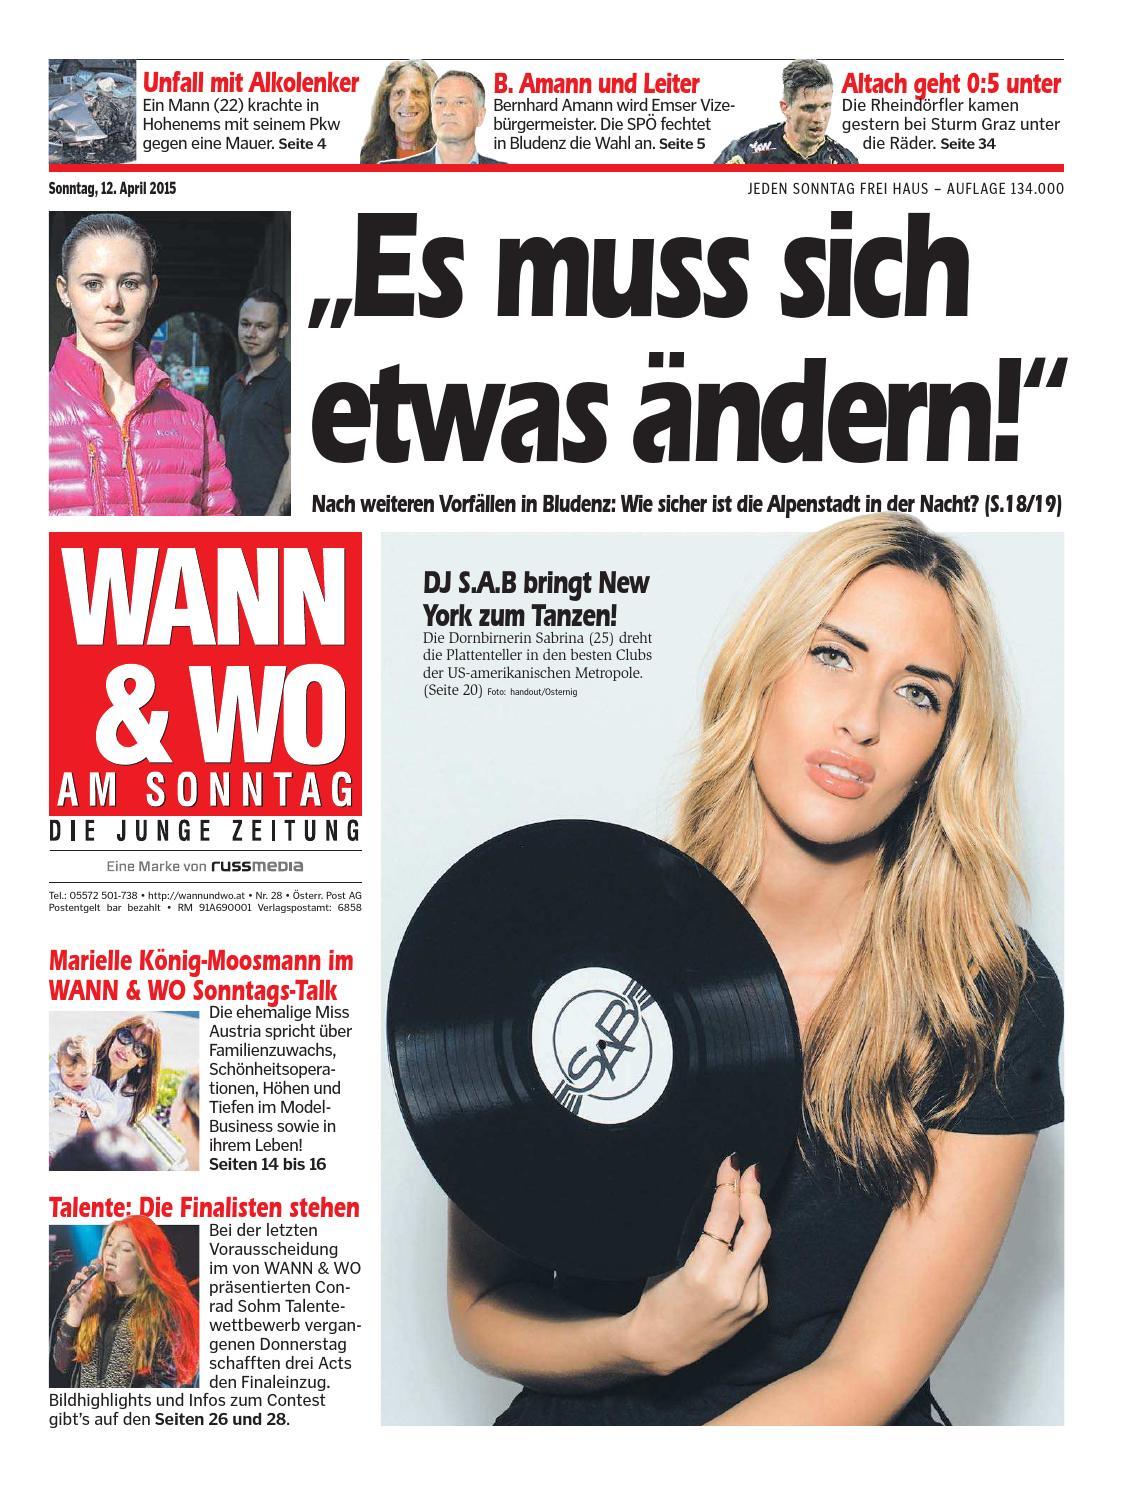 Dating Schiff Bludenz, Svizzera Singles Graz Mariatrost